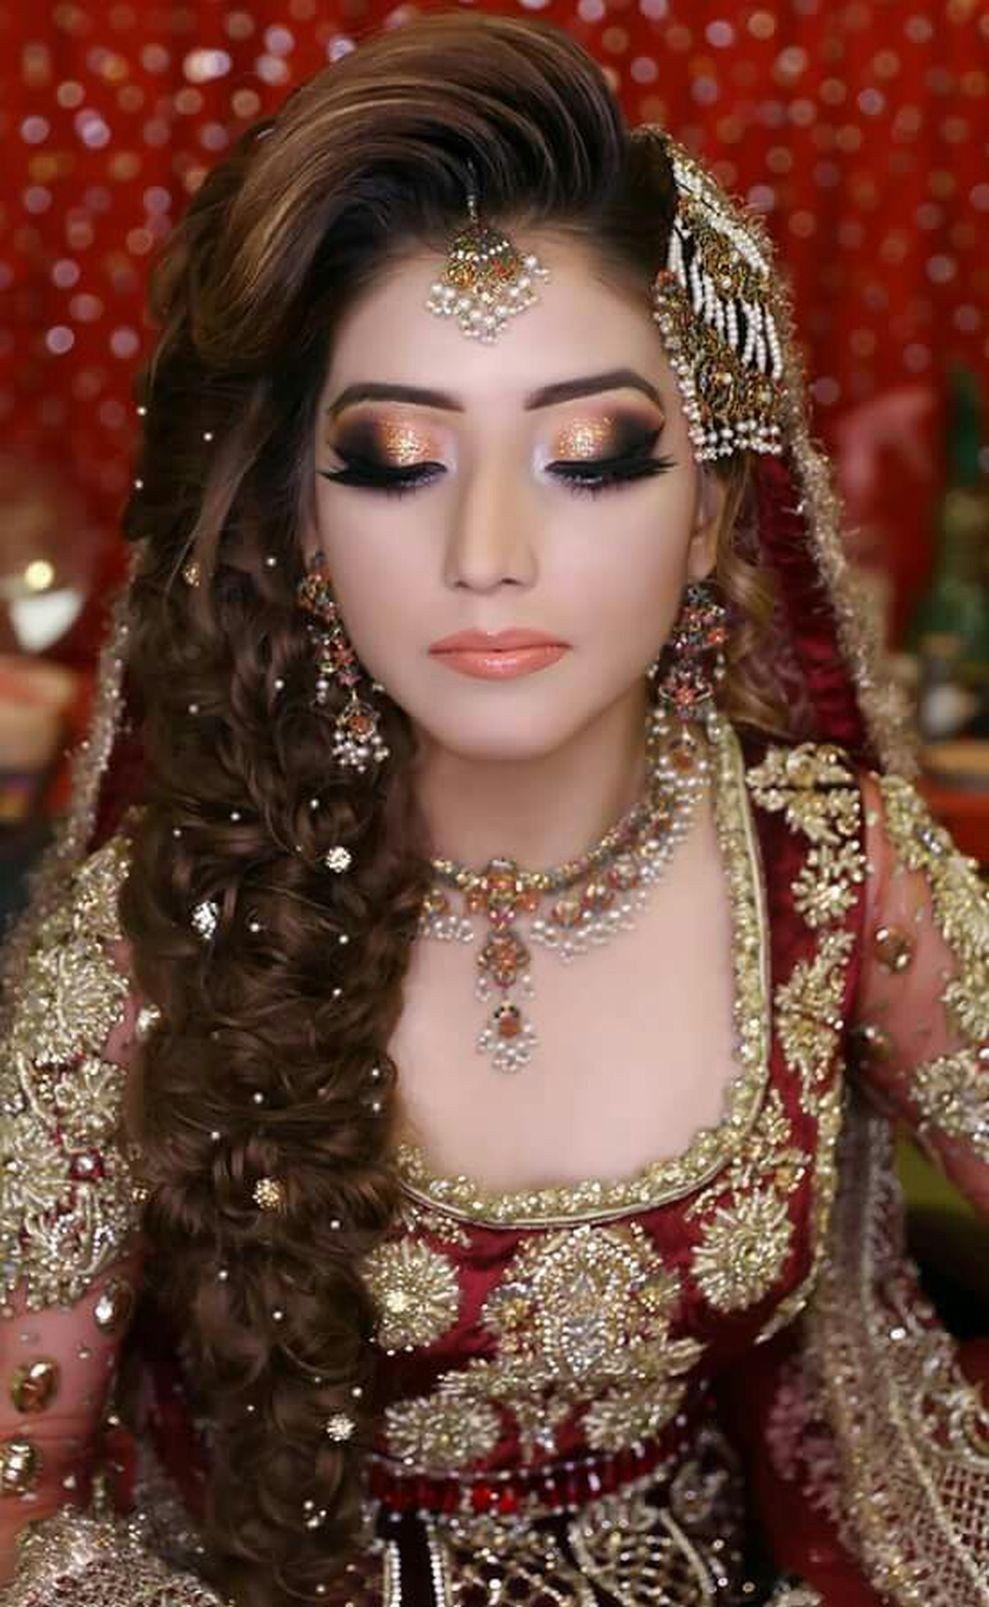 stylish wedding hairstyle ideas for indian bride 01 | delhi